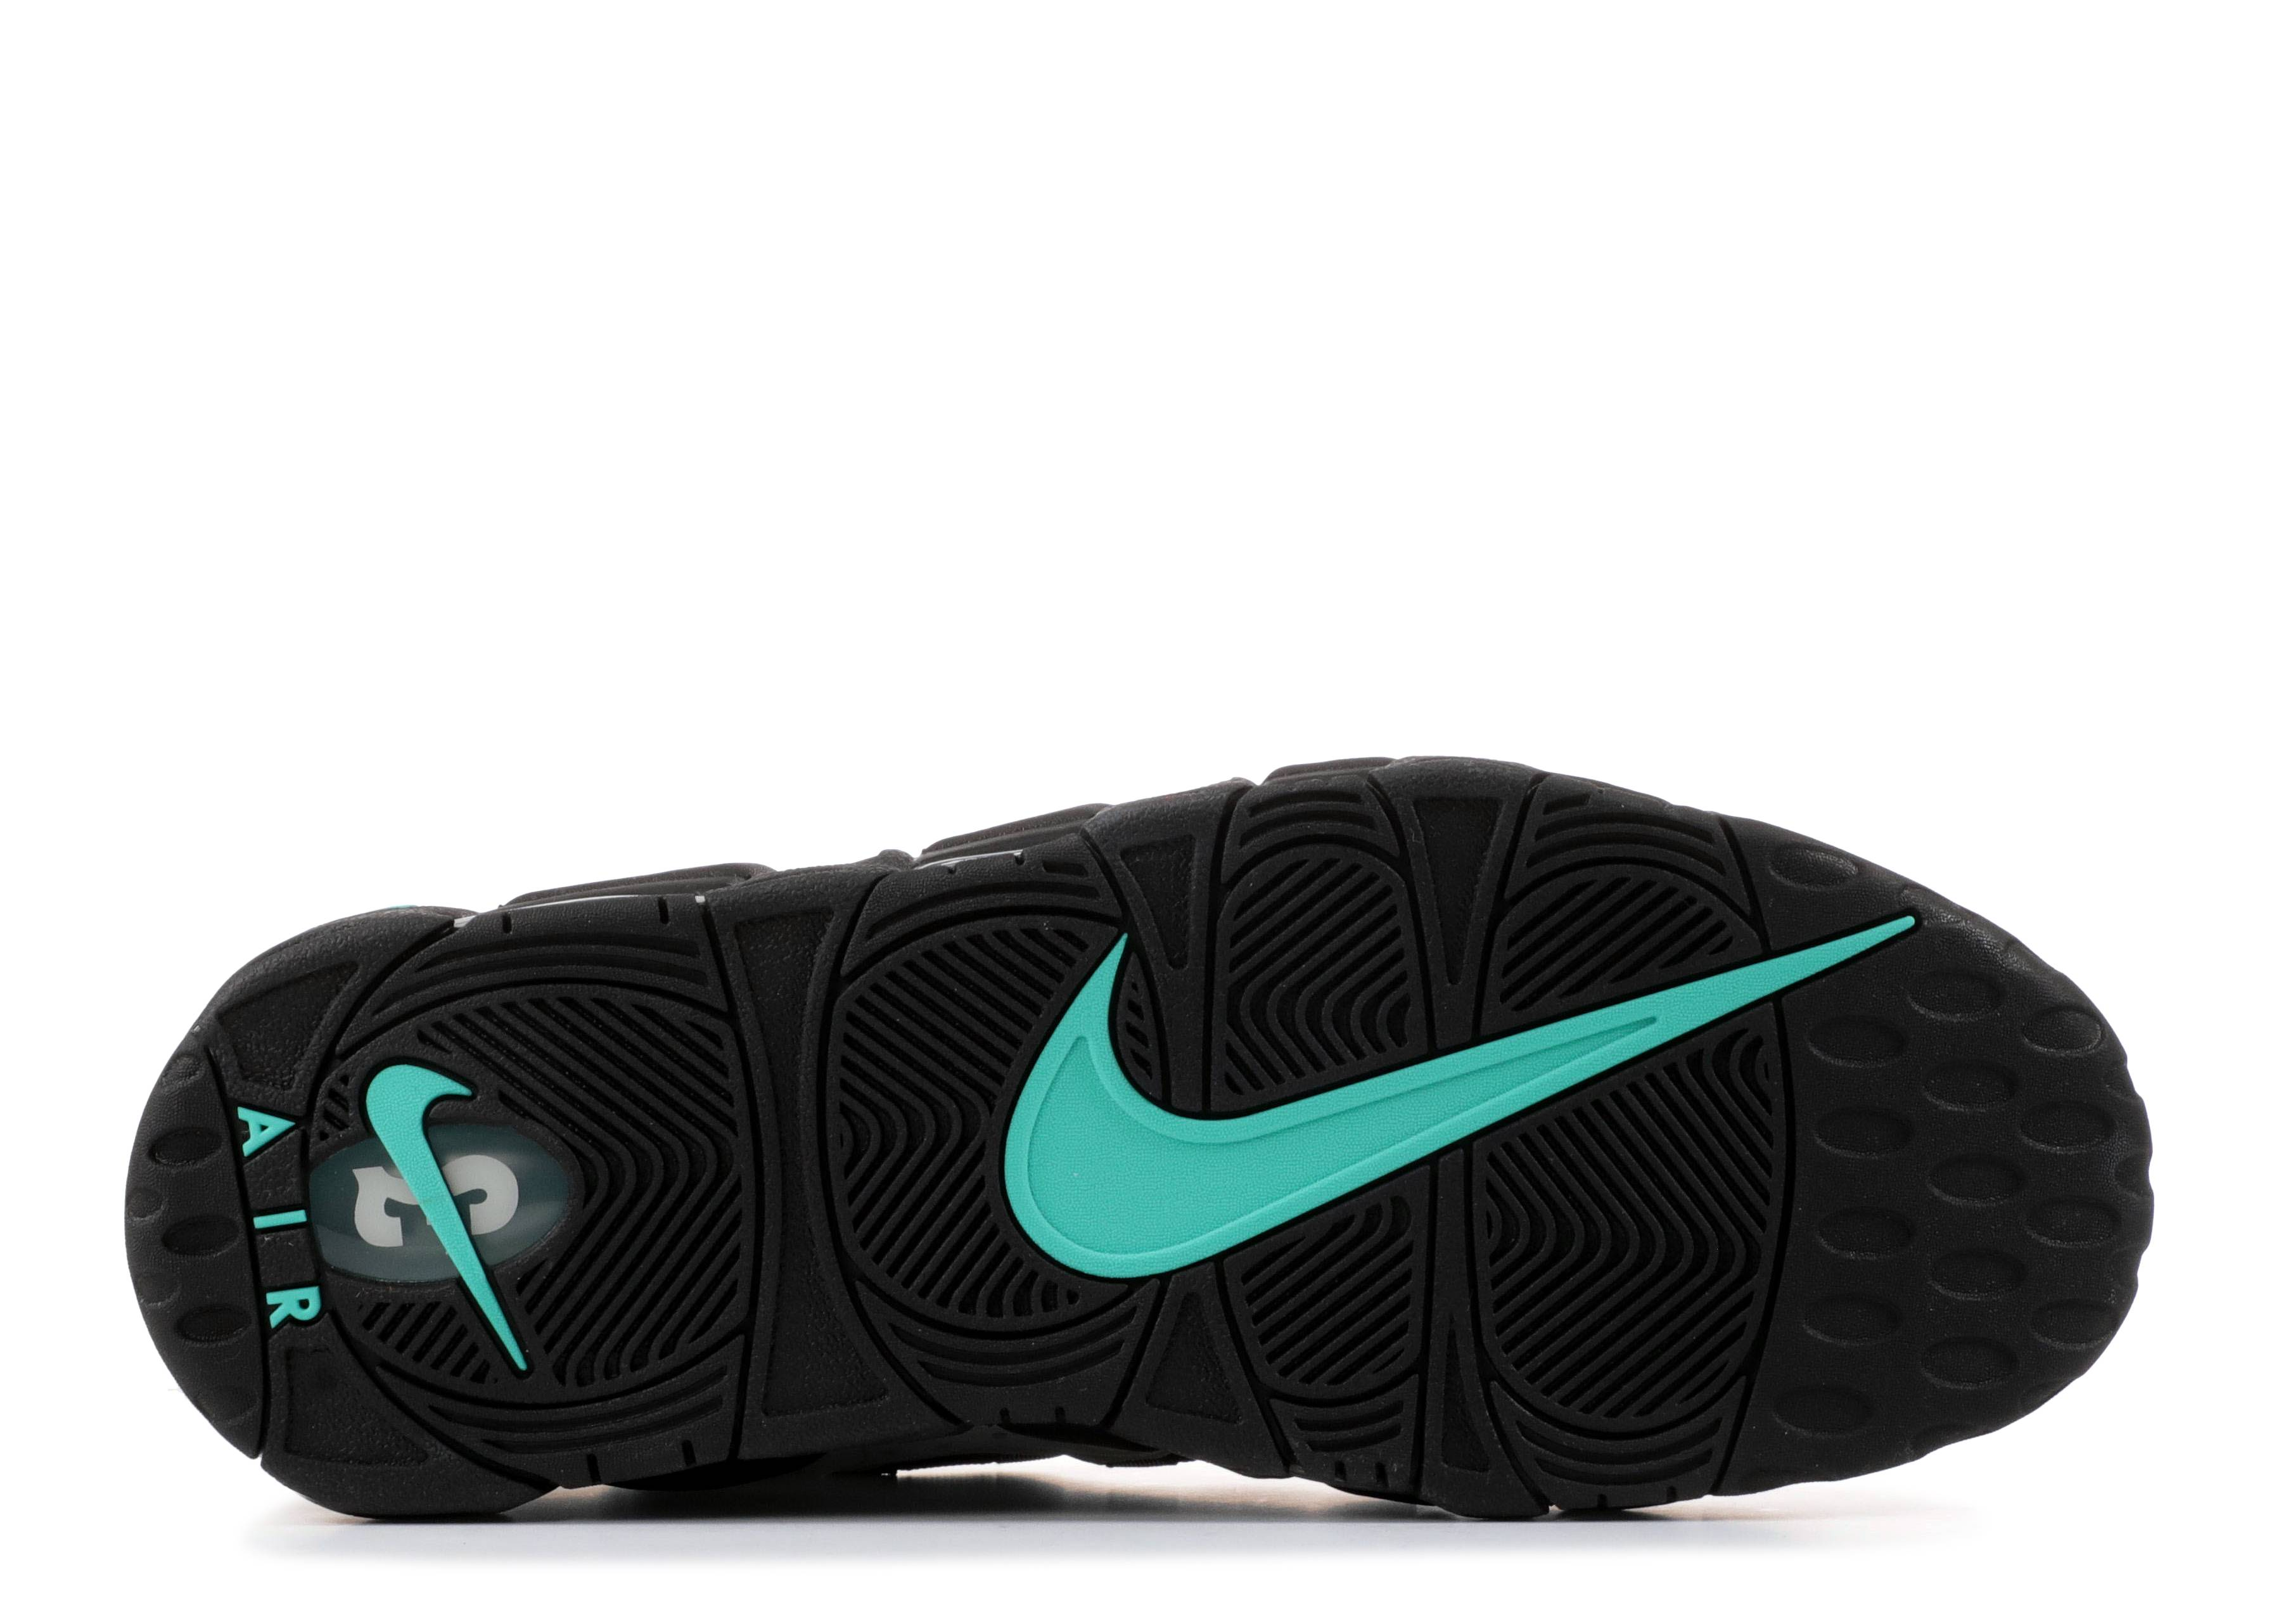 83d7cb80dd61 Chinese Nike Free Size 12 Nike Clearance Sale